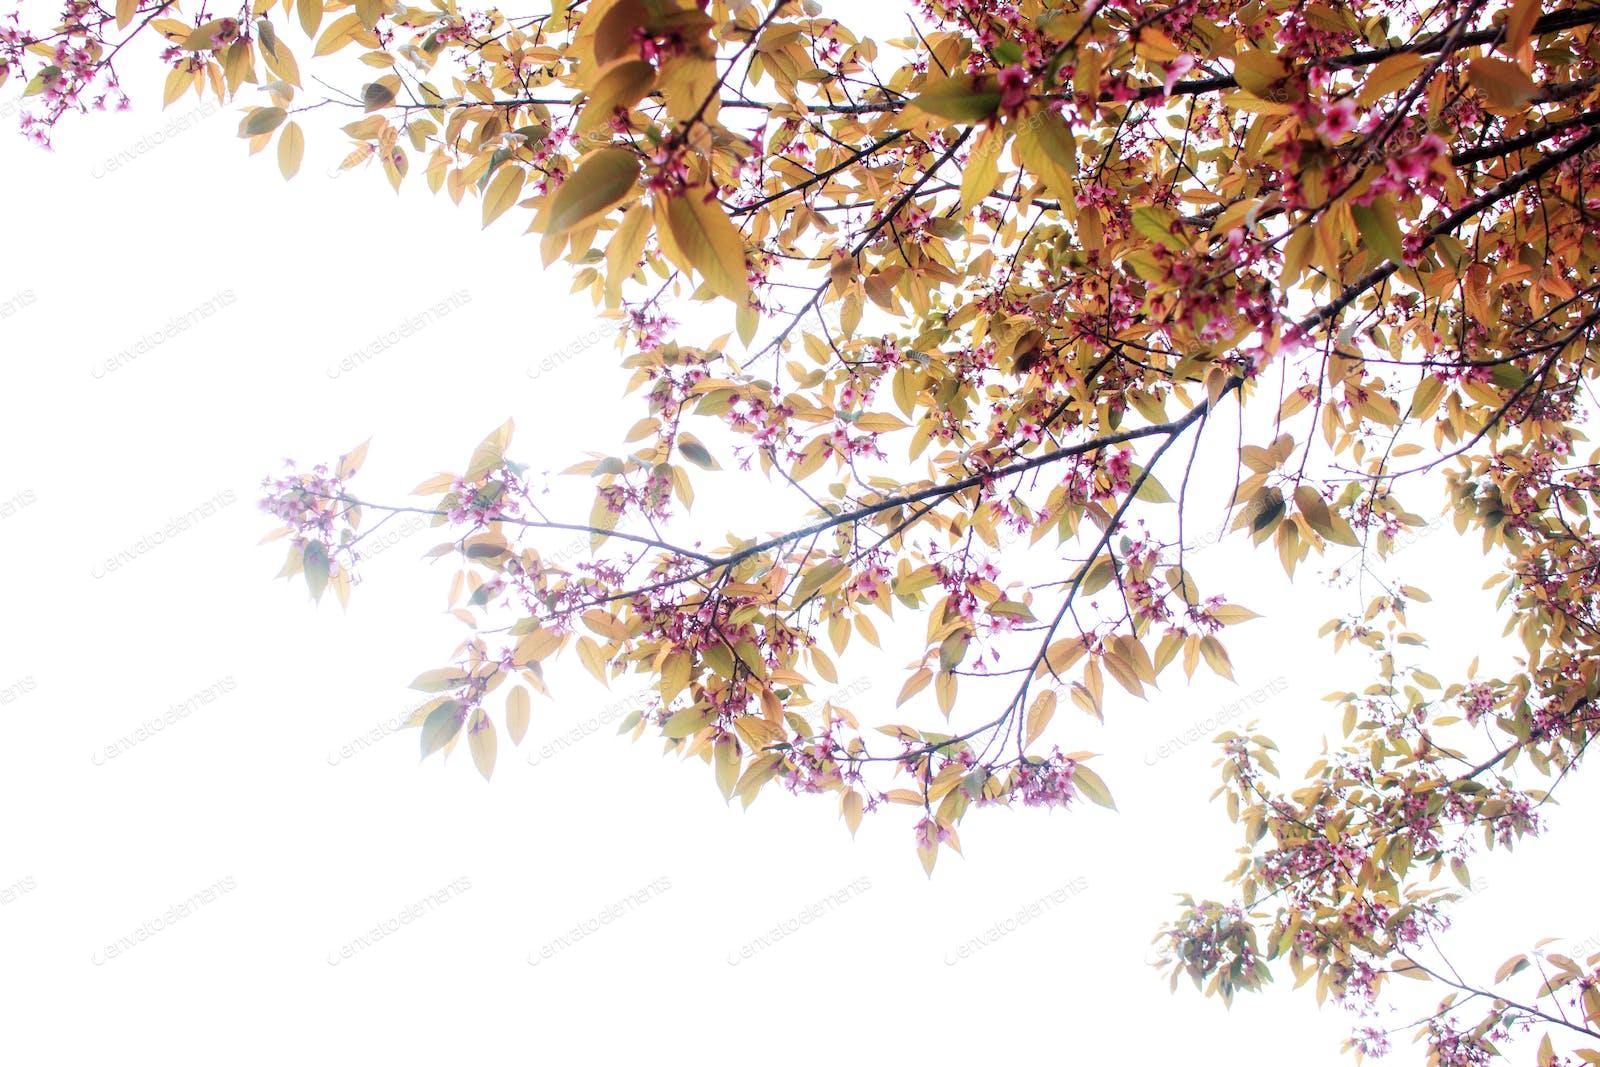 Sakura Flowers With White Background Photo By Start08 On Envato Elements